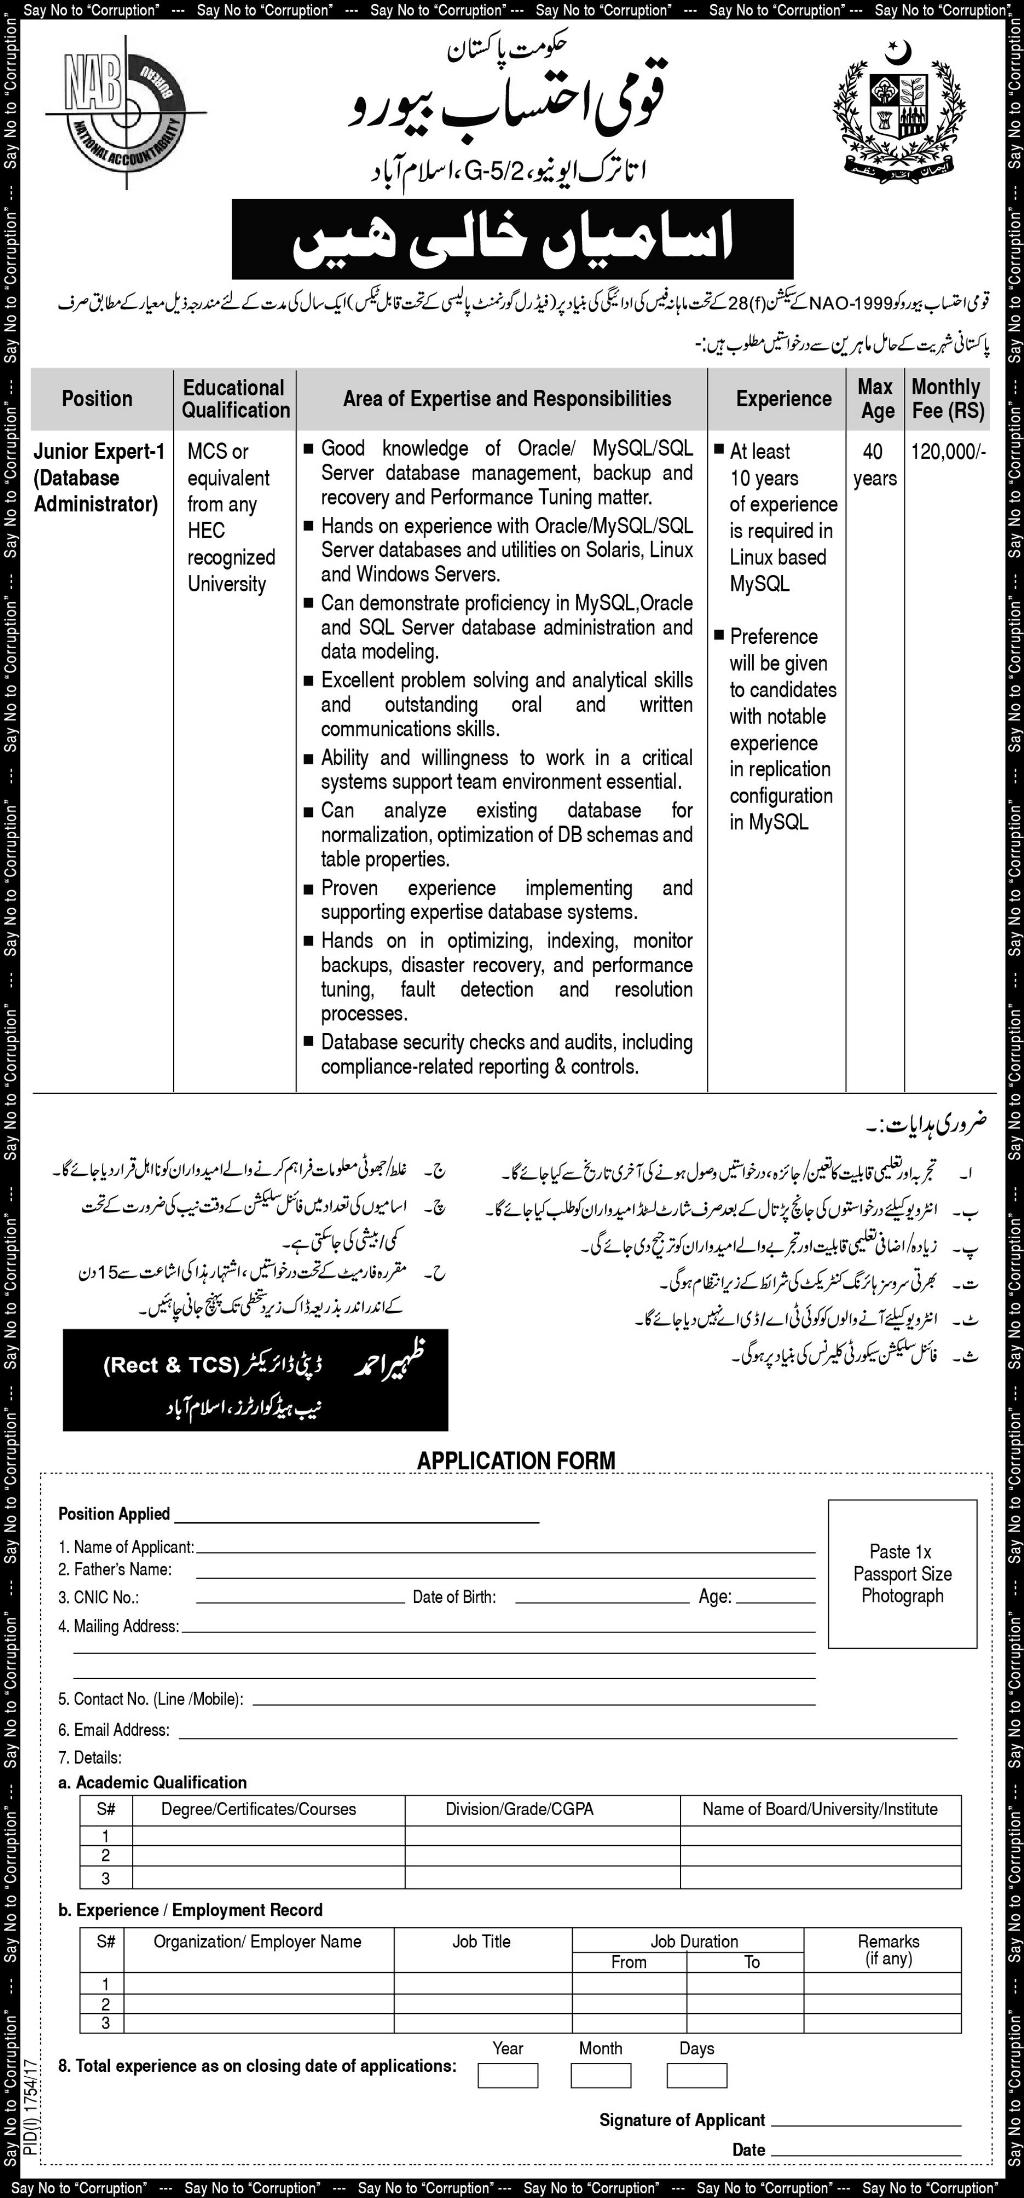 NAB Islamabad Jobs 2017 Download Application Form October Advertisement